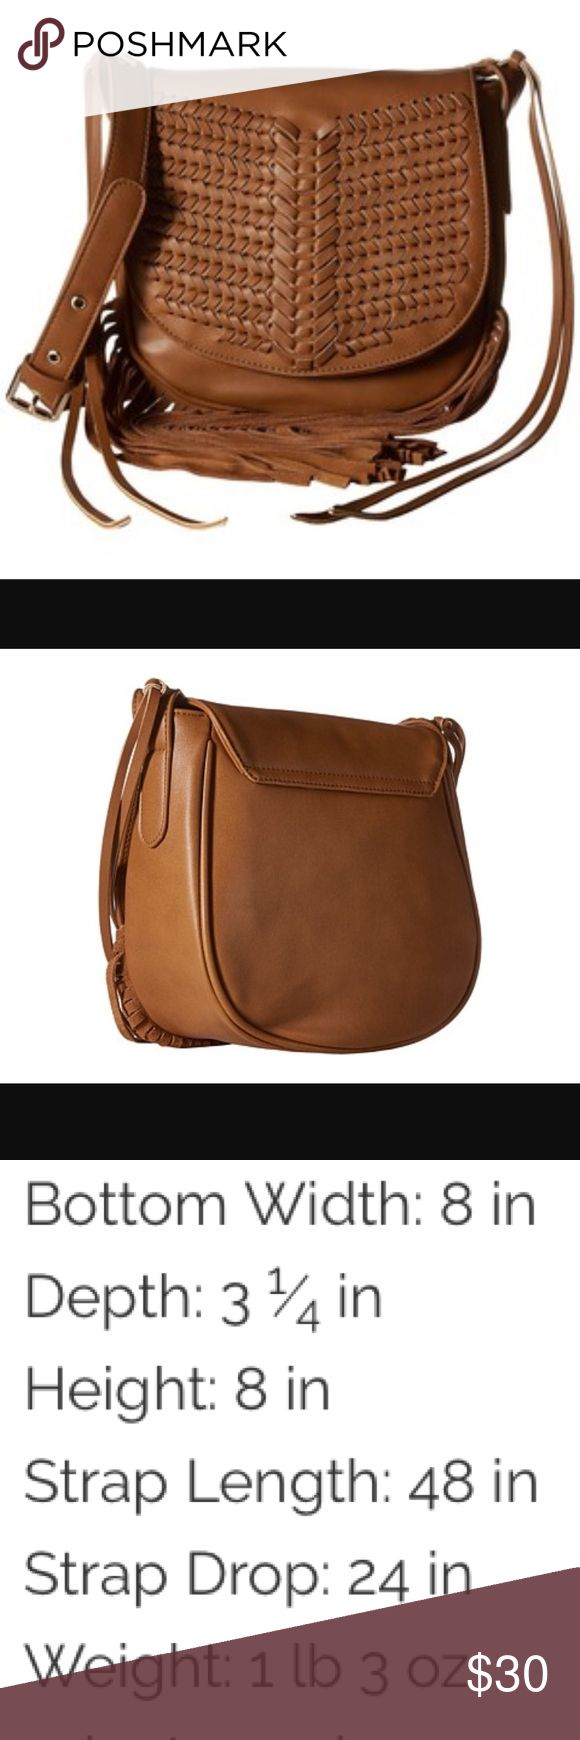 Fringes Brand new! Brand Gabriella Rocha BCBGeneration Bags Crossbody Bags